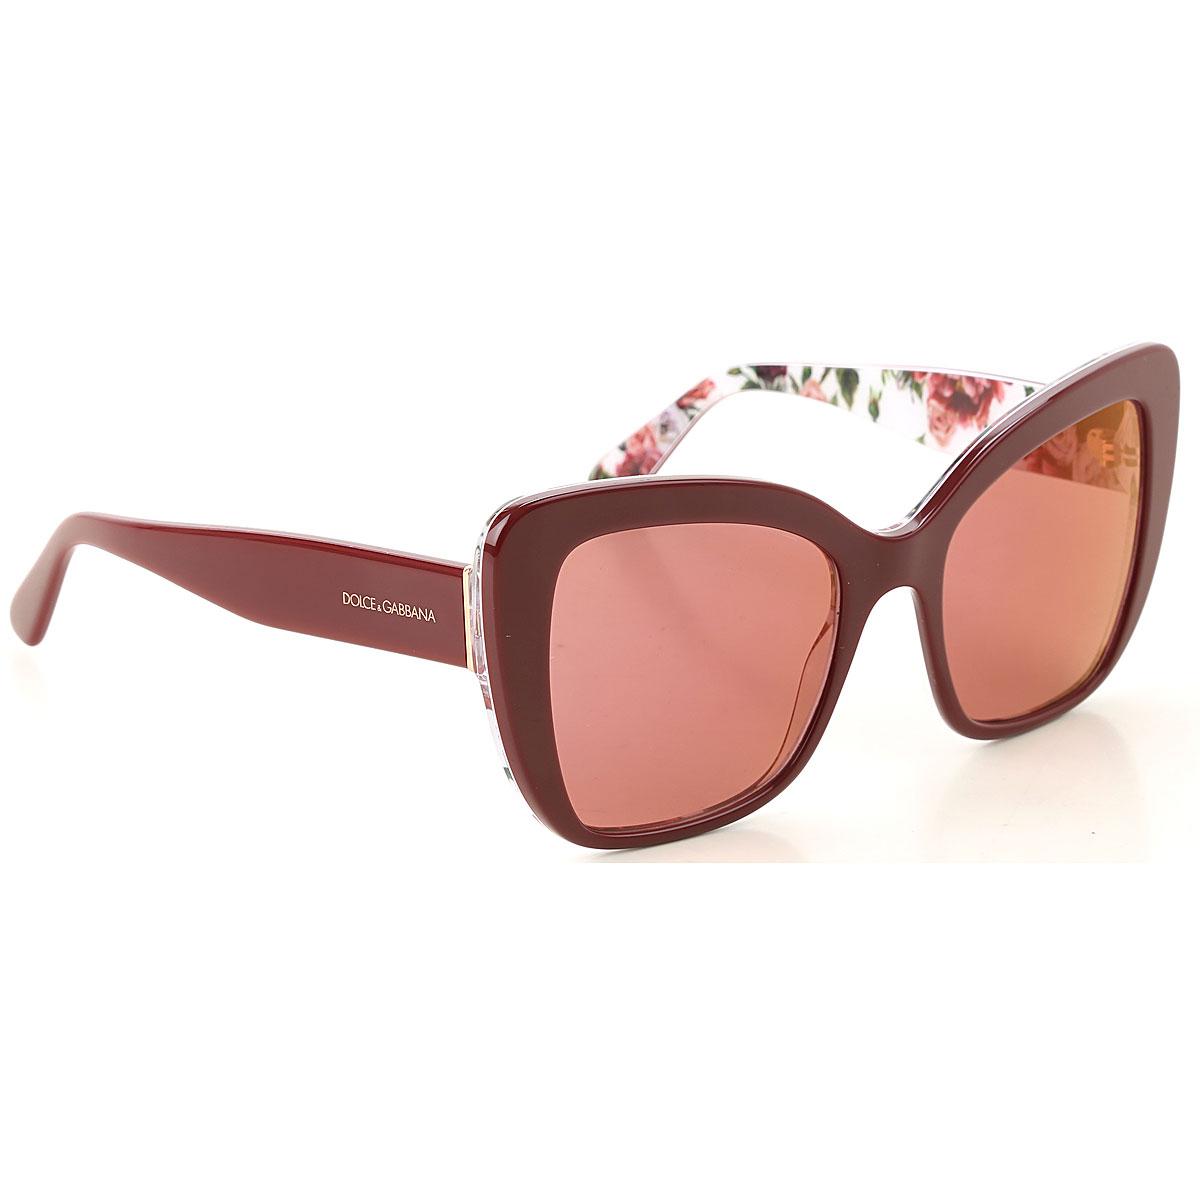 f296c06646e9 Dolce   Gabbana. Sunglasses